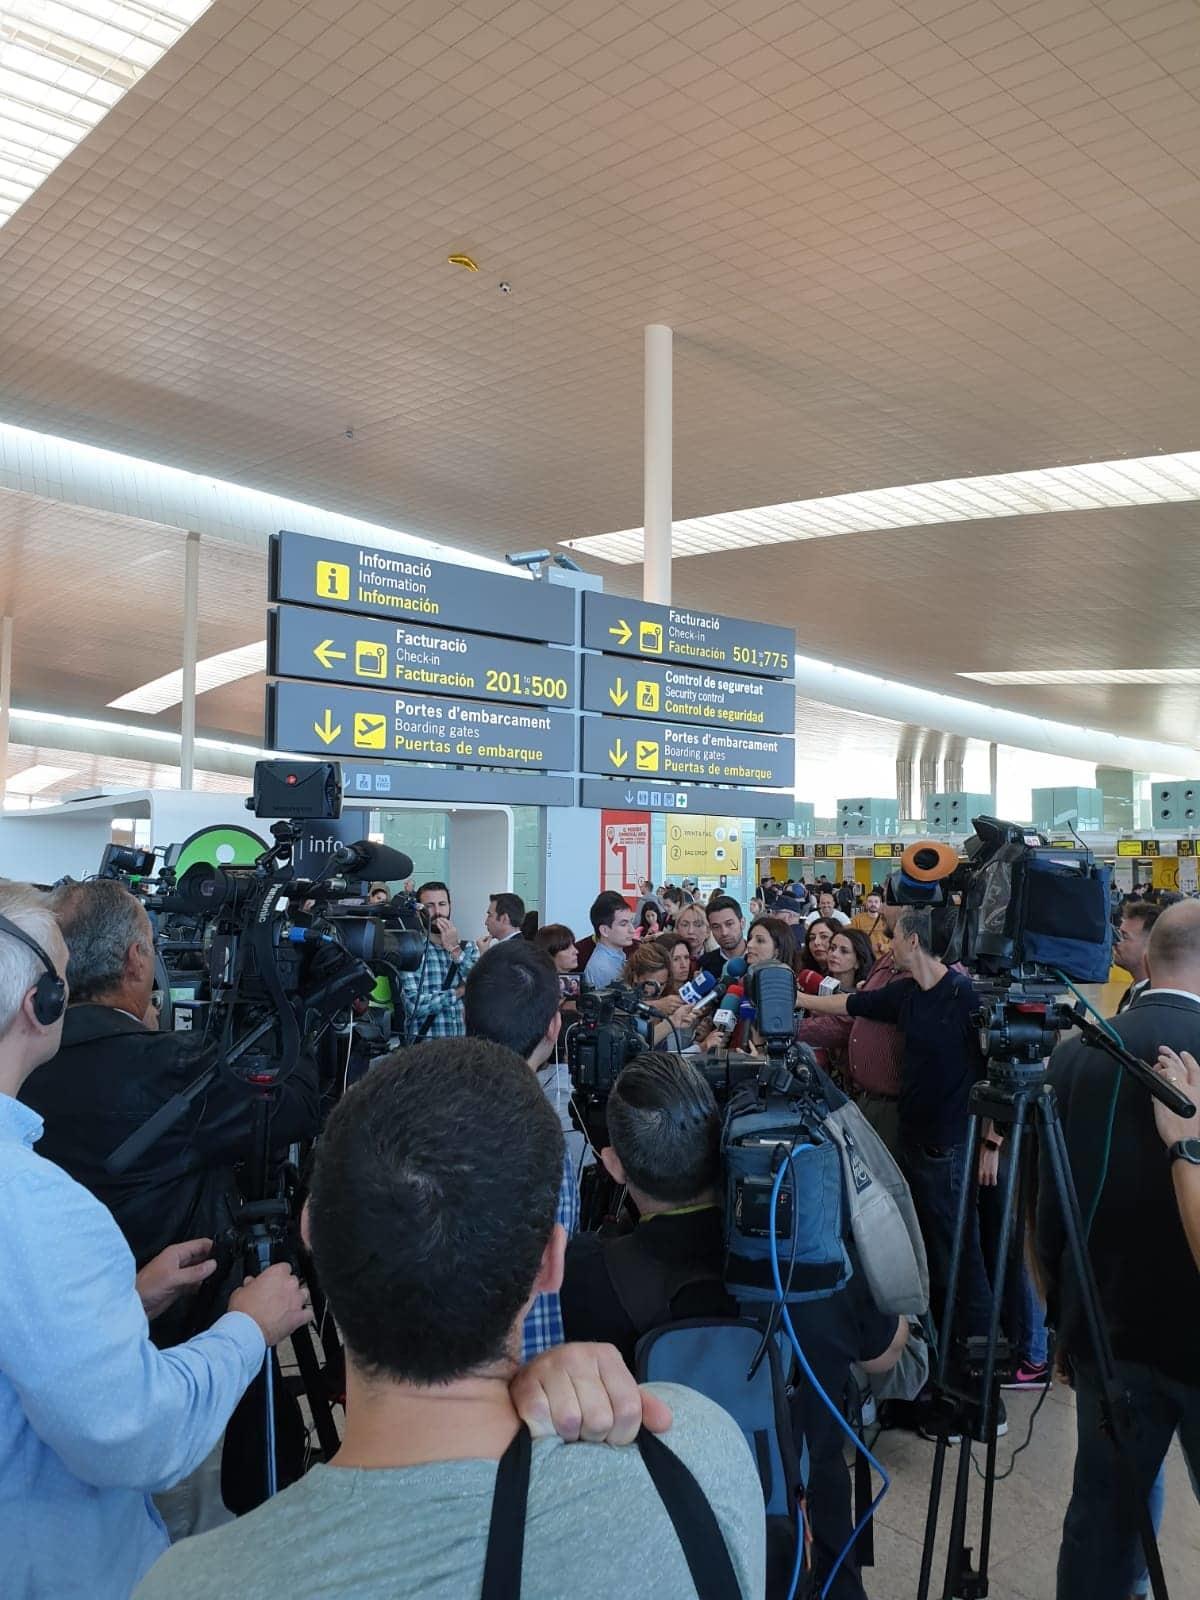 Aerodromi blokirani, letovi se otkazuju - Na�i �itaoci javljaju informacije sa lica mesta! (FOTO/VIDEO)